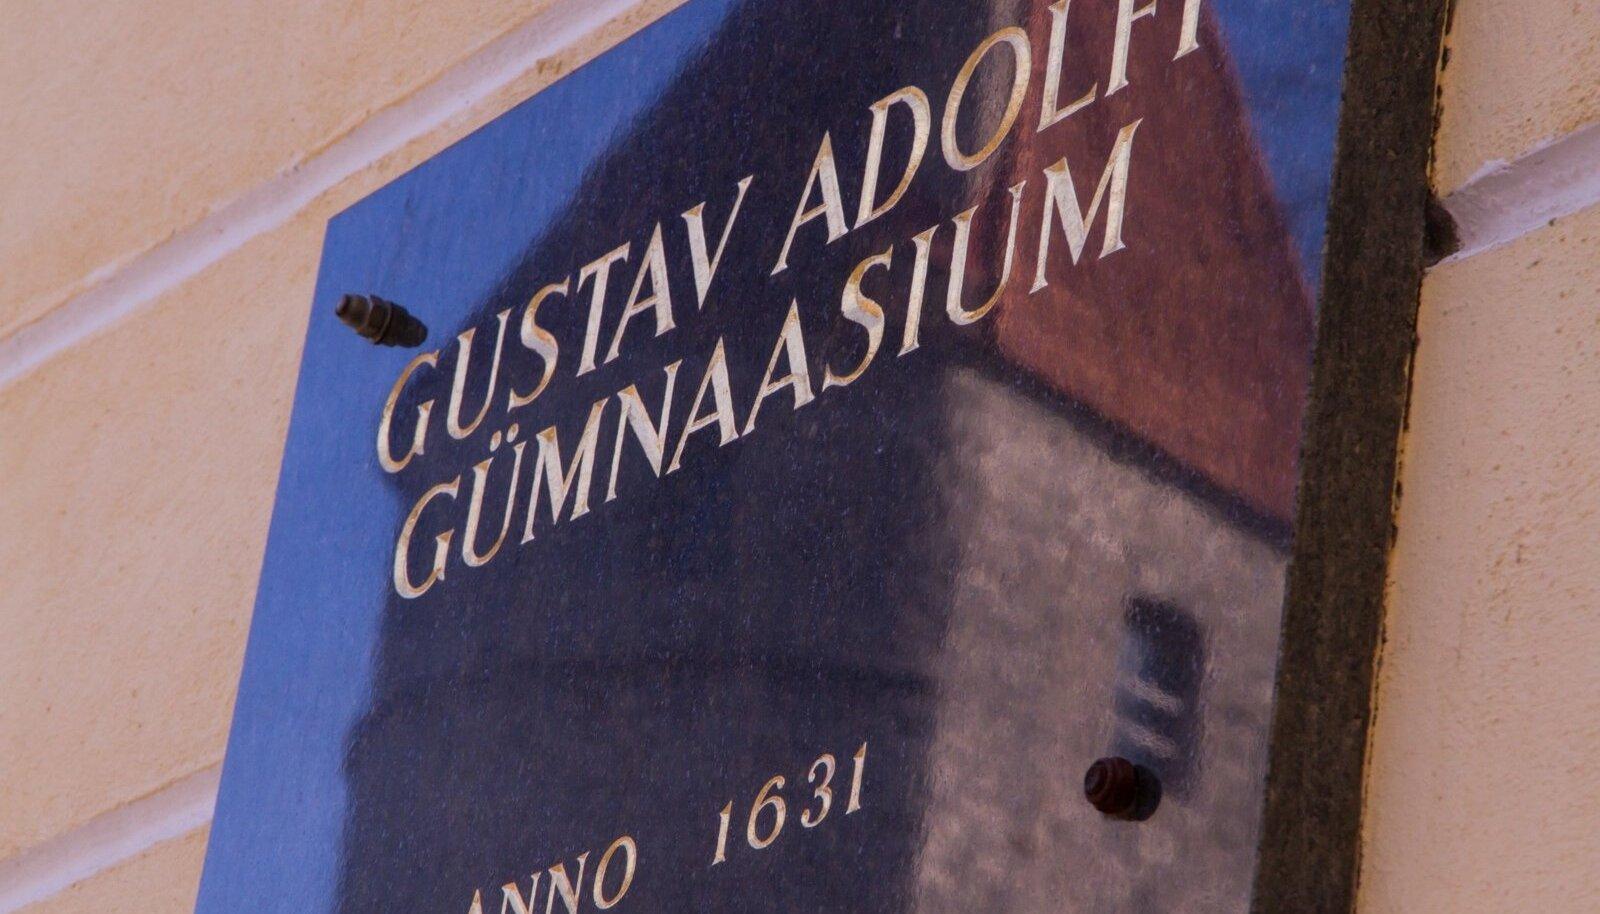 Gustav Adolfi Gümnaasium